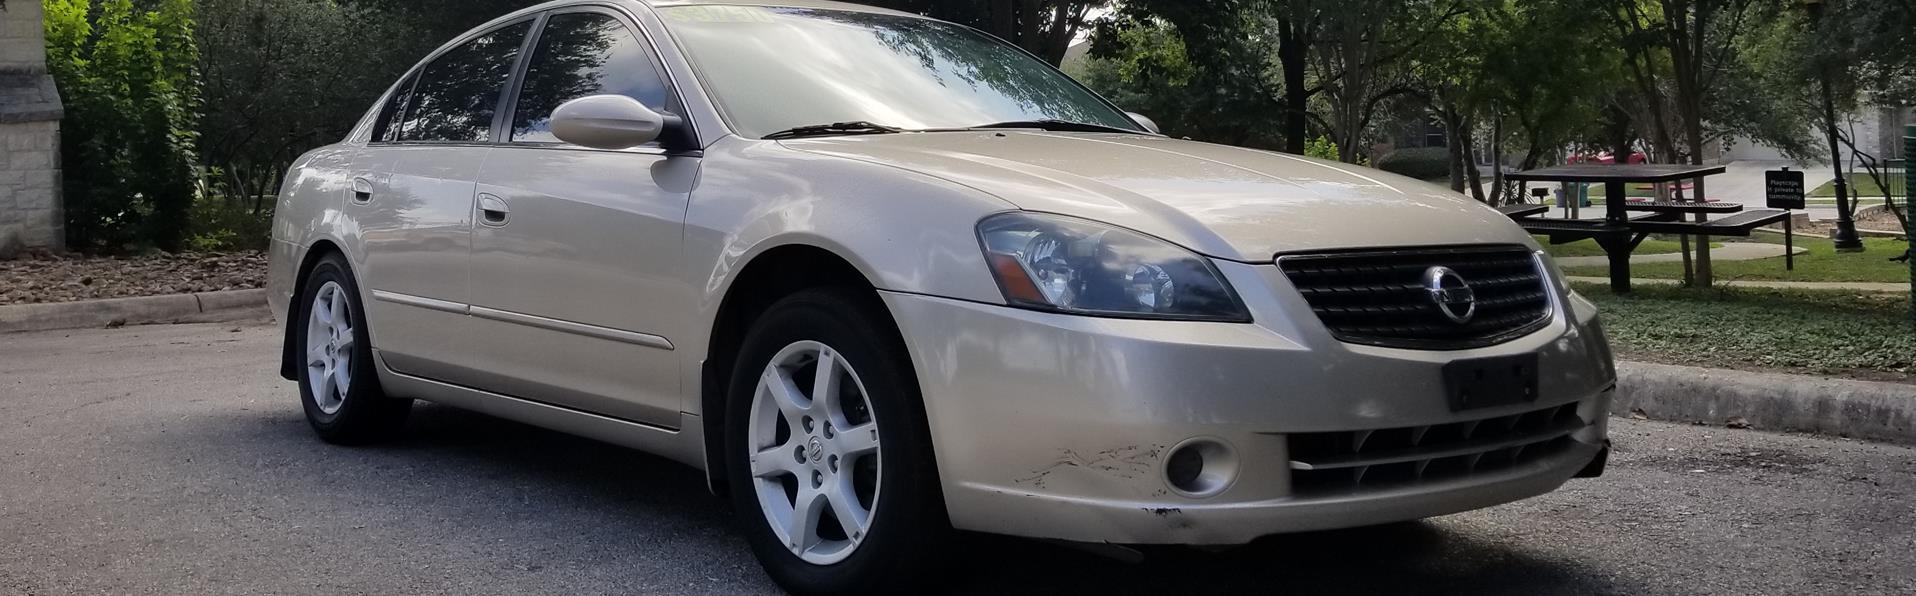 Used Cars San Antonio TX | Used Cars & Trucks TX | Easy American ...